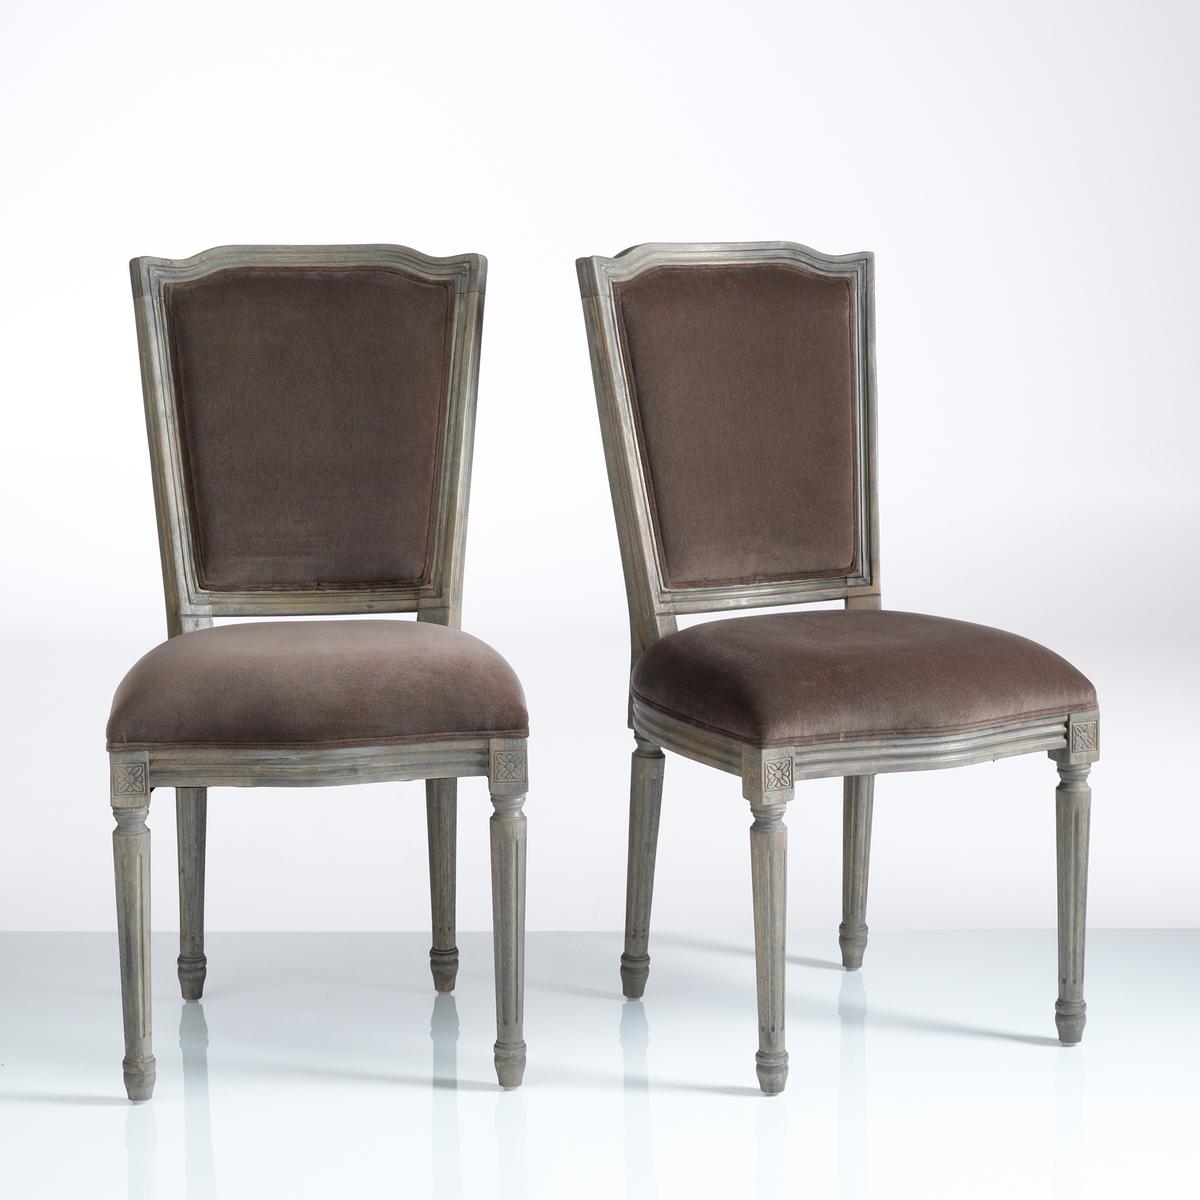 Комплект из 2 стульев в стиле Людовика XVI, Trianon бульонница trianon